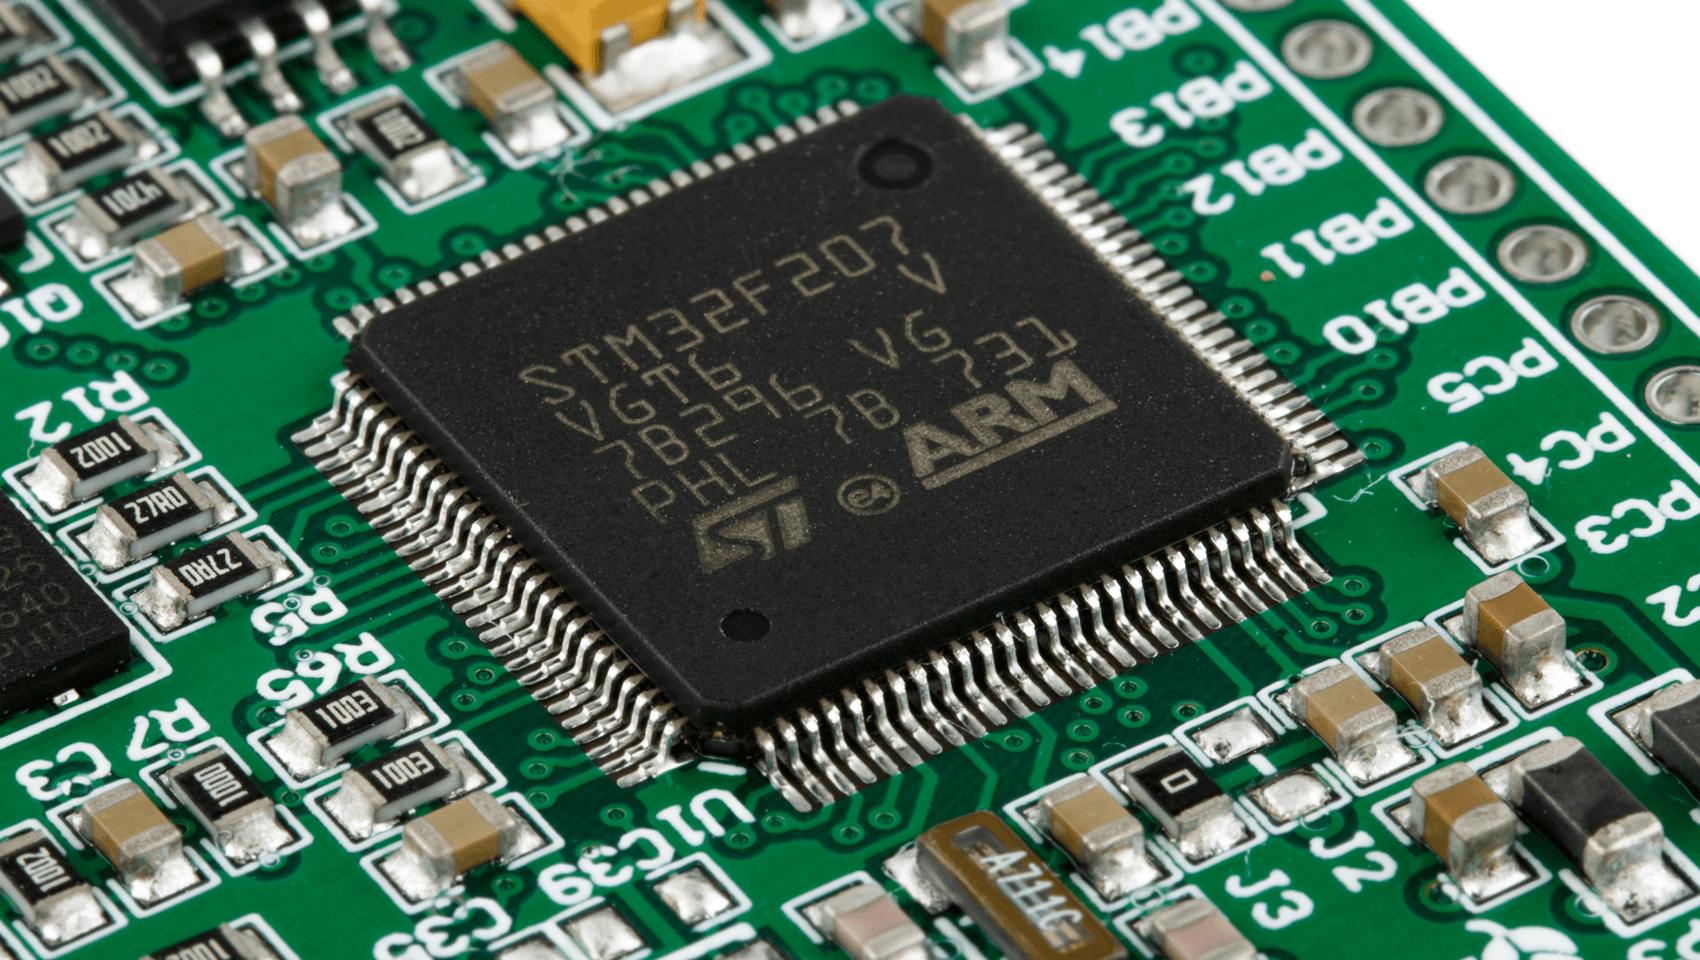 Mikroe mikromedia for STM32 M3